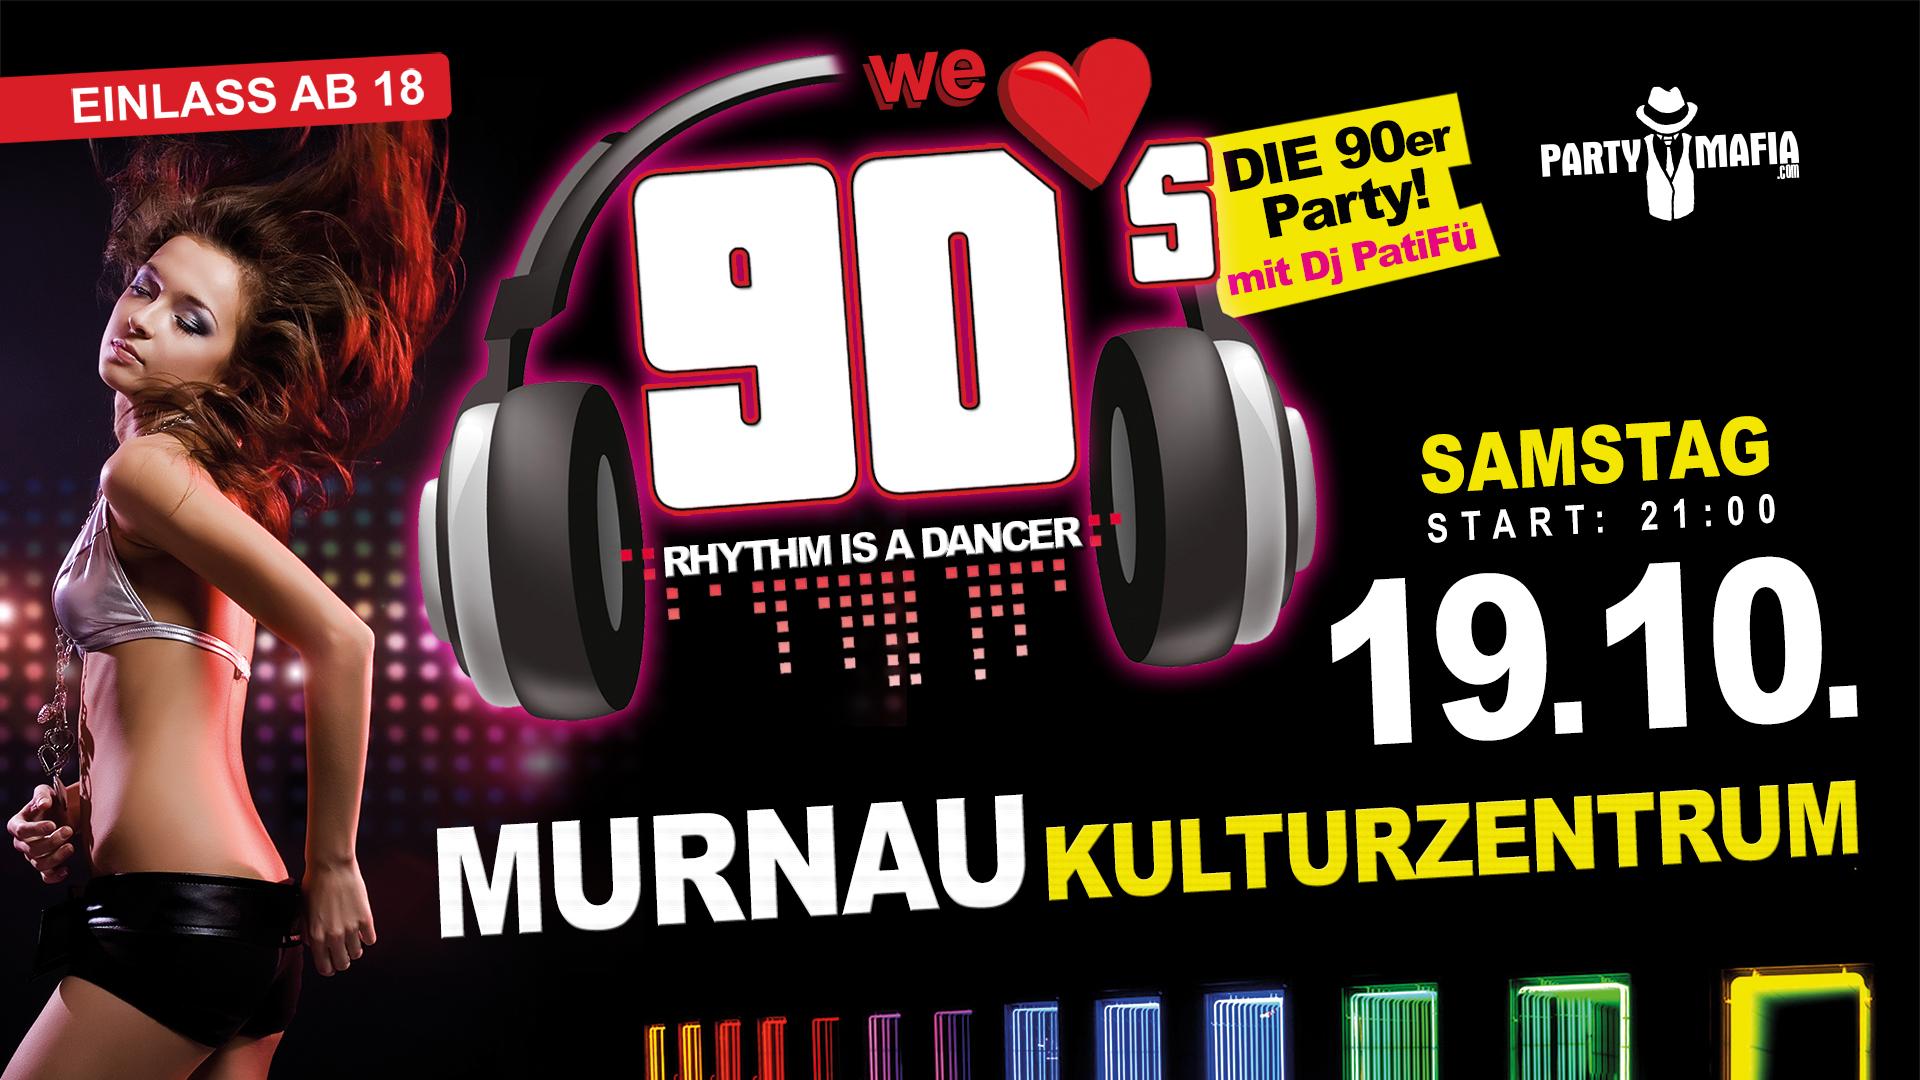 Party Highlight, Kultparty in Murnau: Die legendäre 90er Party